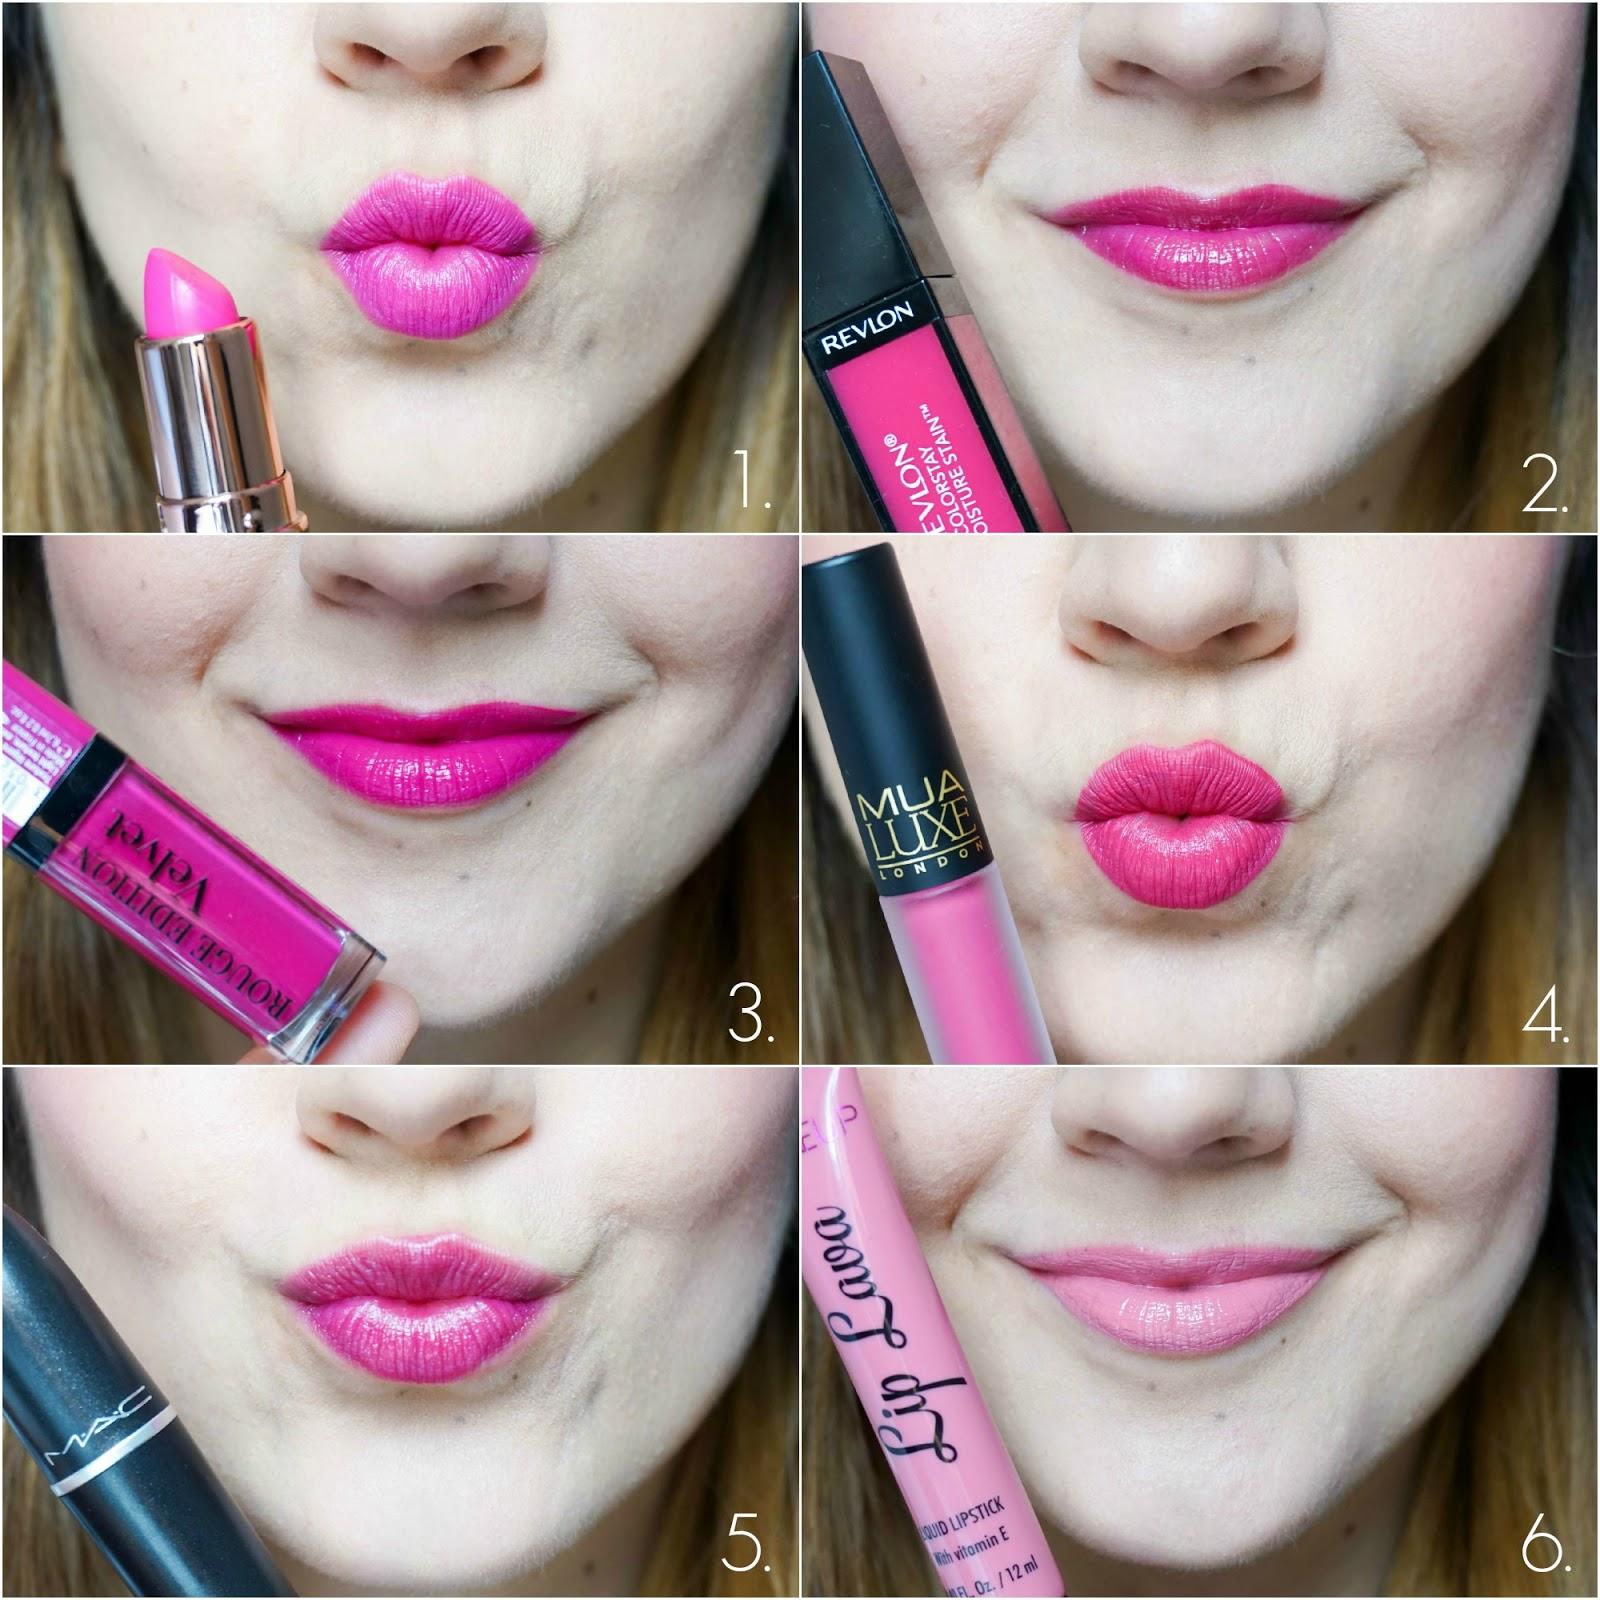 Pink Summer Lips, MAC, Makeup Revolution, Bourjois, Revlon, MUA